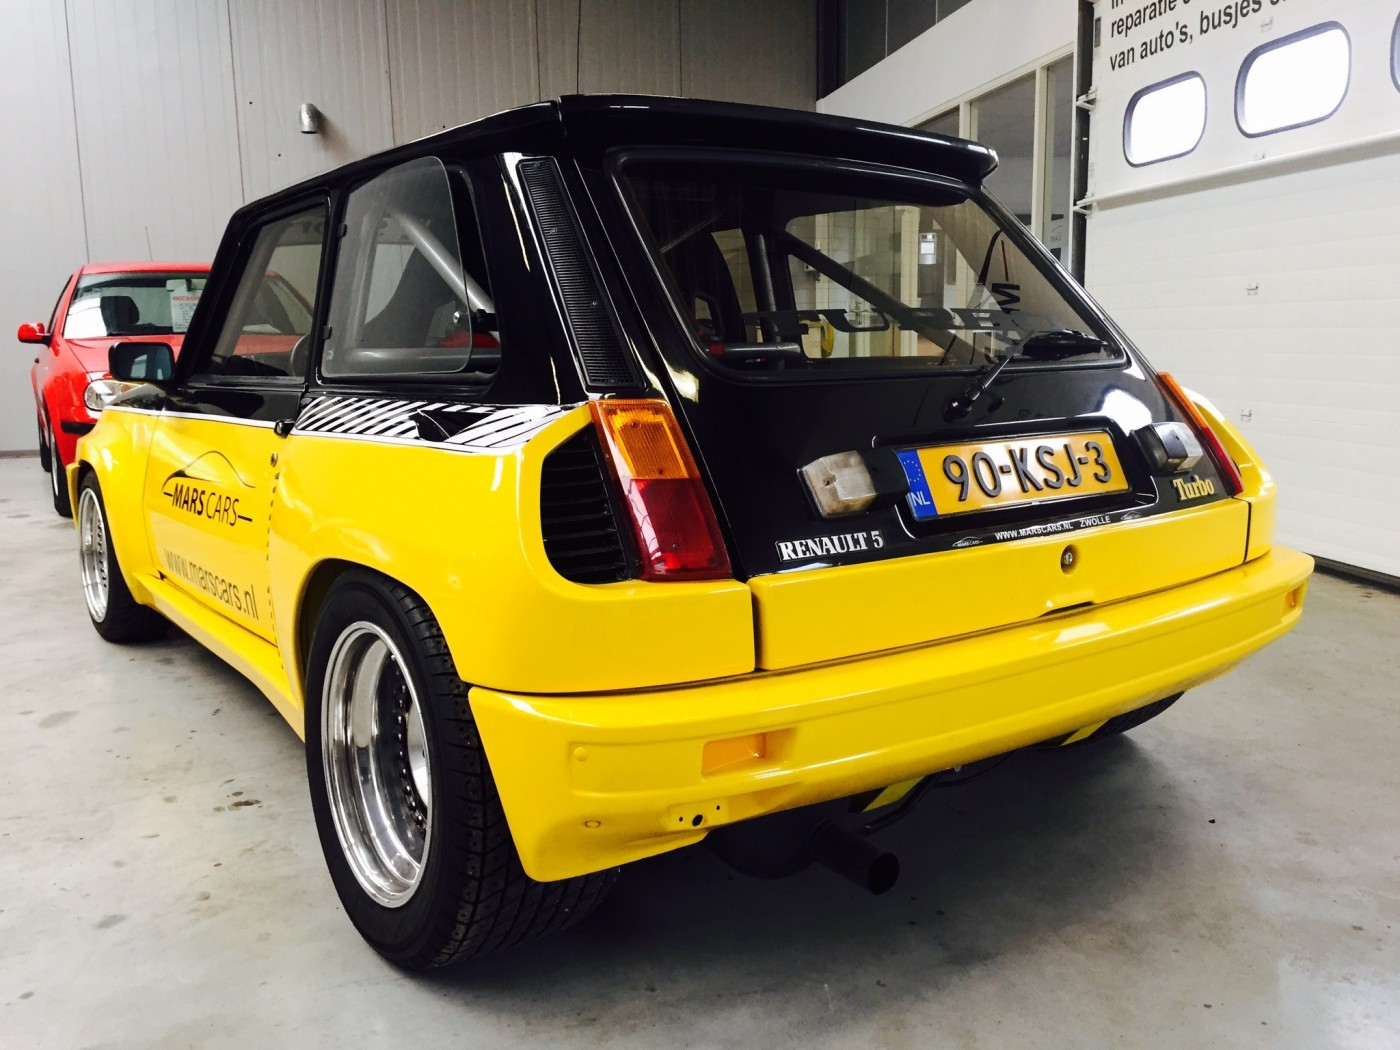 Renault_5_R5_Turbo_2_0007